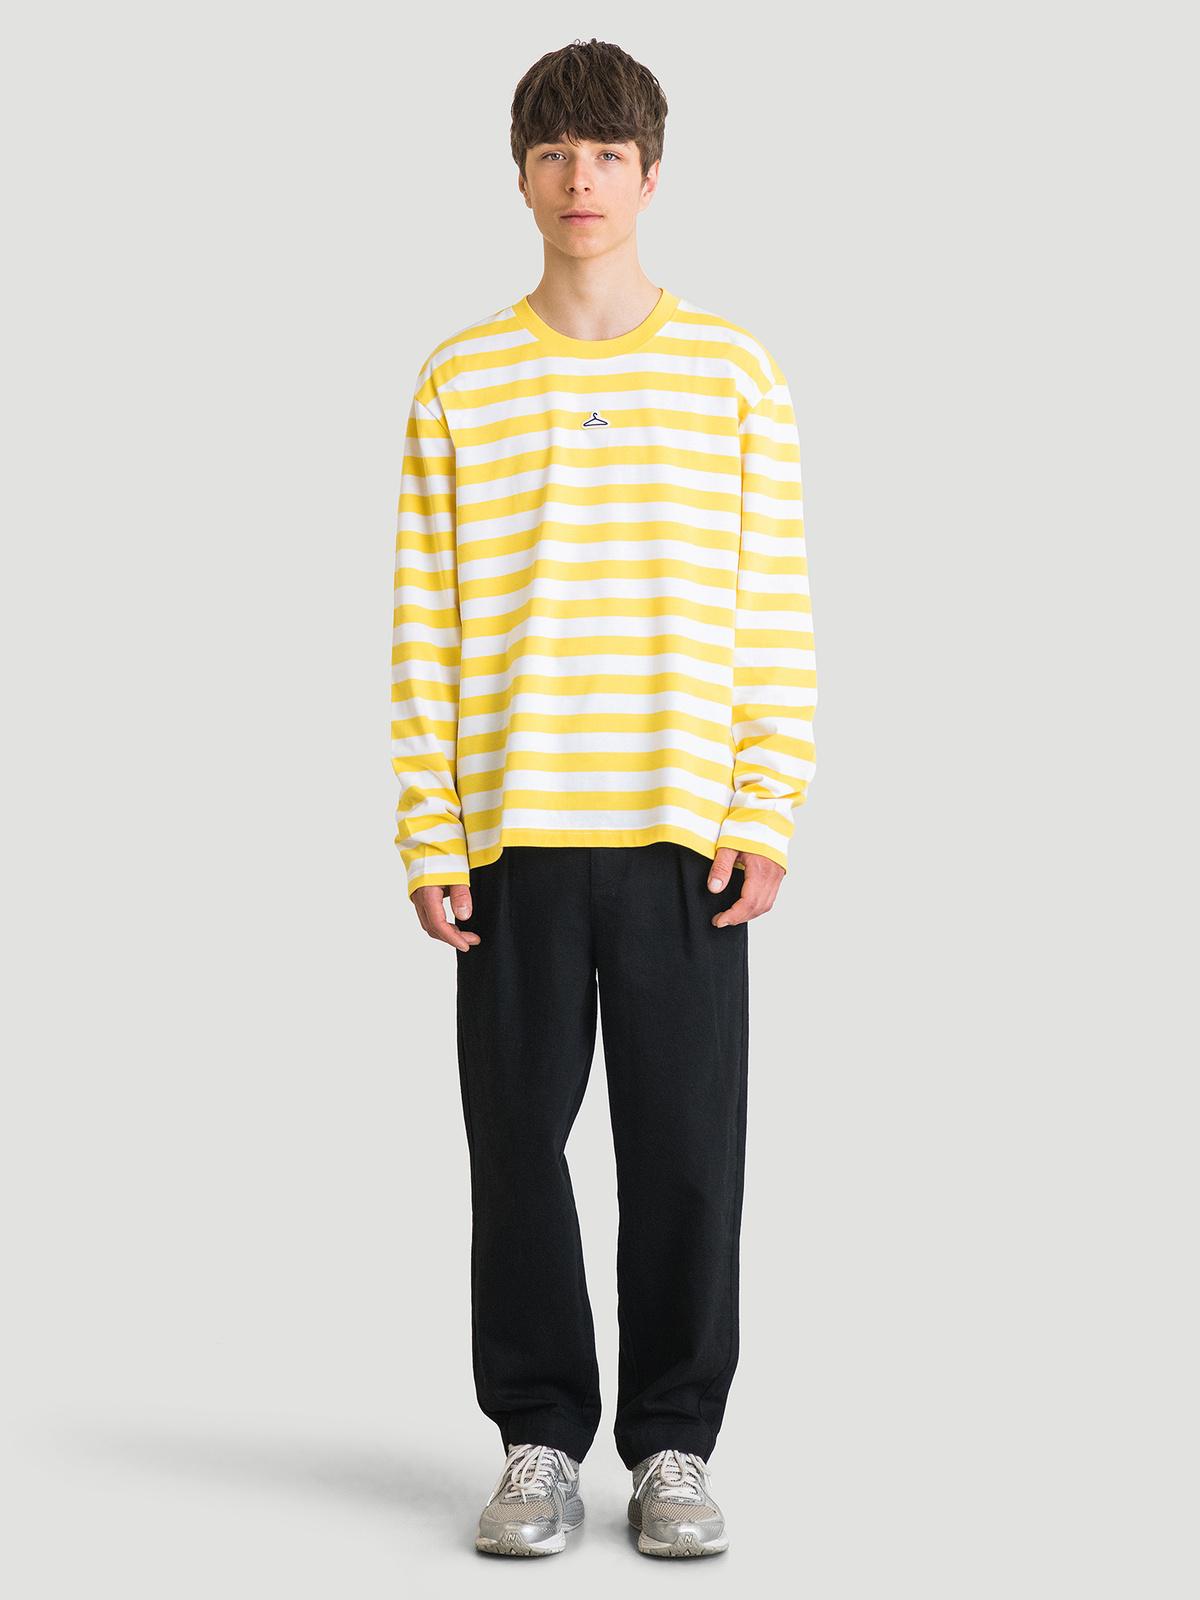 Hanger Striped Longsleeve Yellow White 4